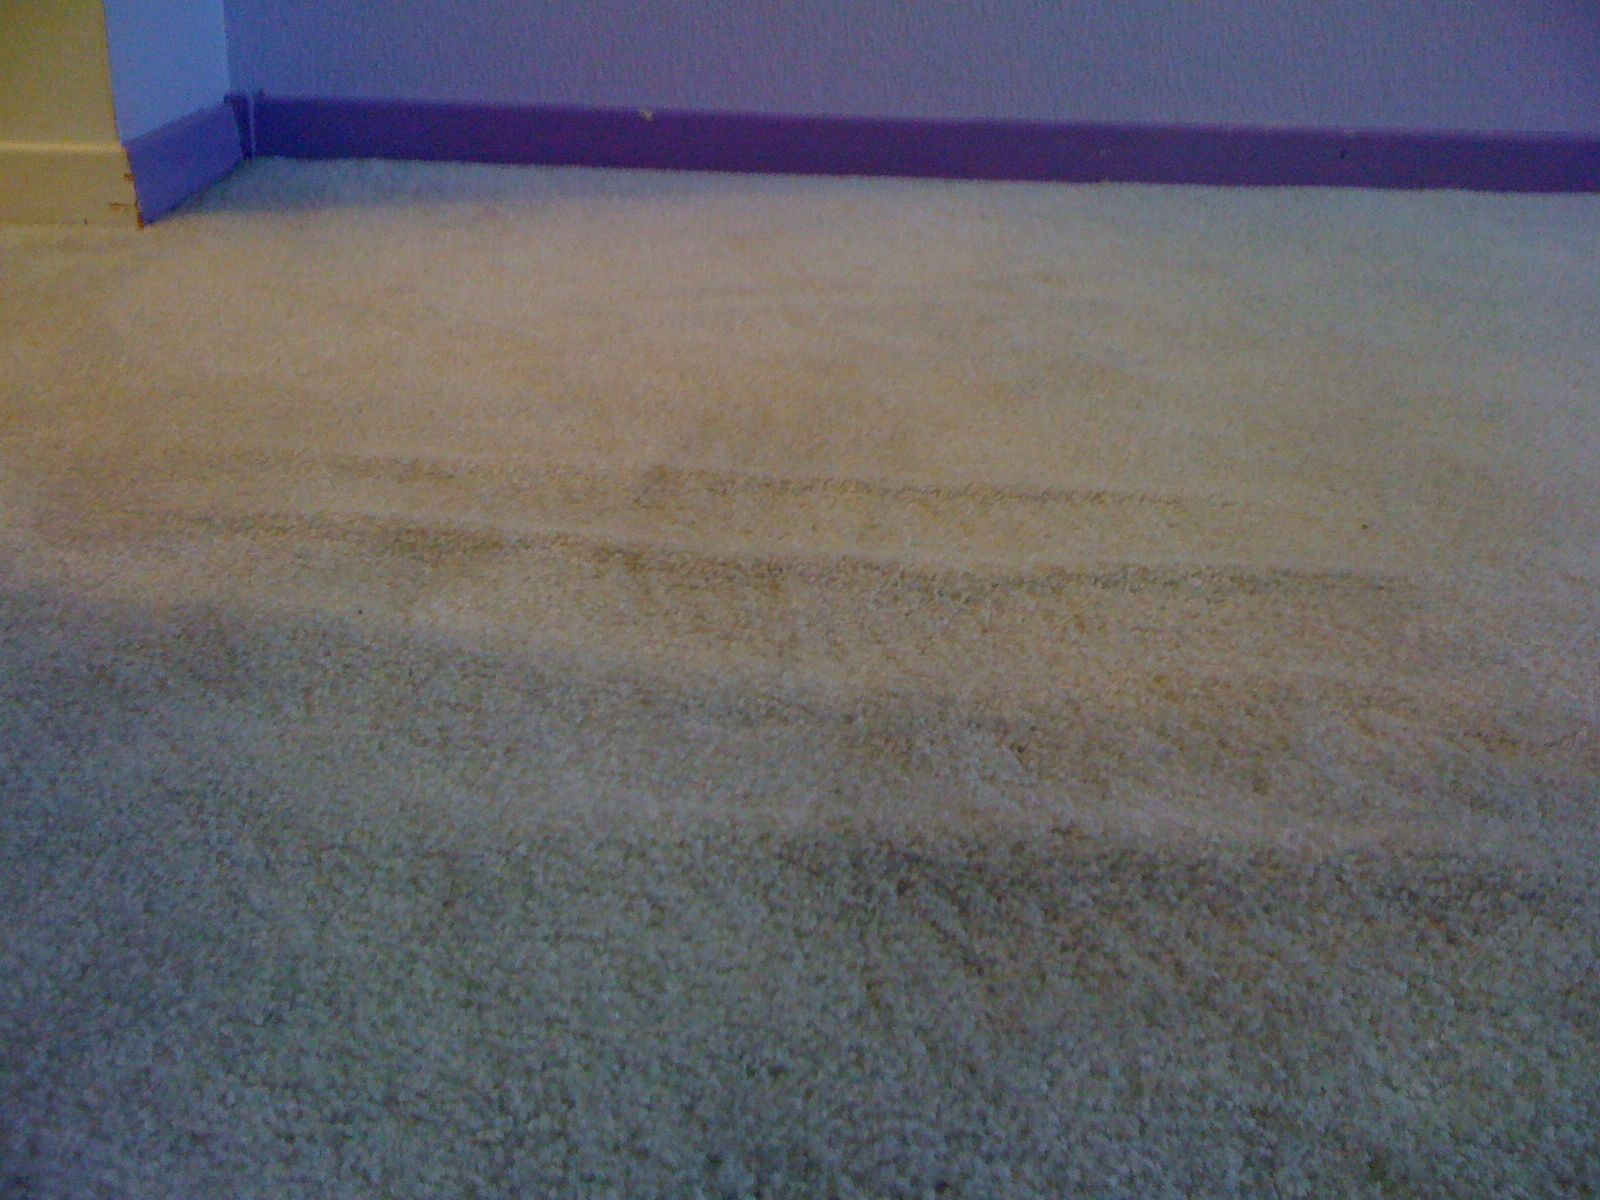 Carpet Repair In Portland Sean S Carpet Care Carpet Repair Carpet Installation Carpet Care